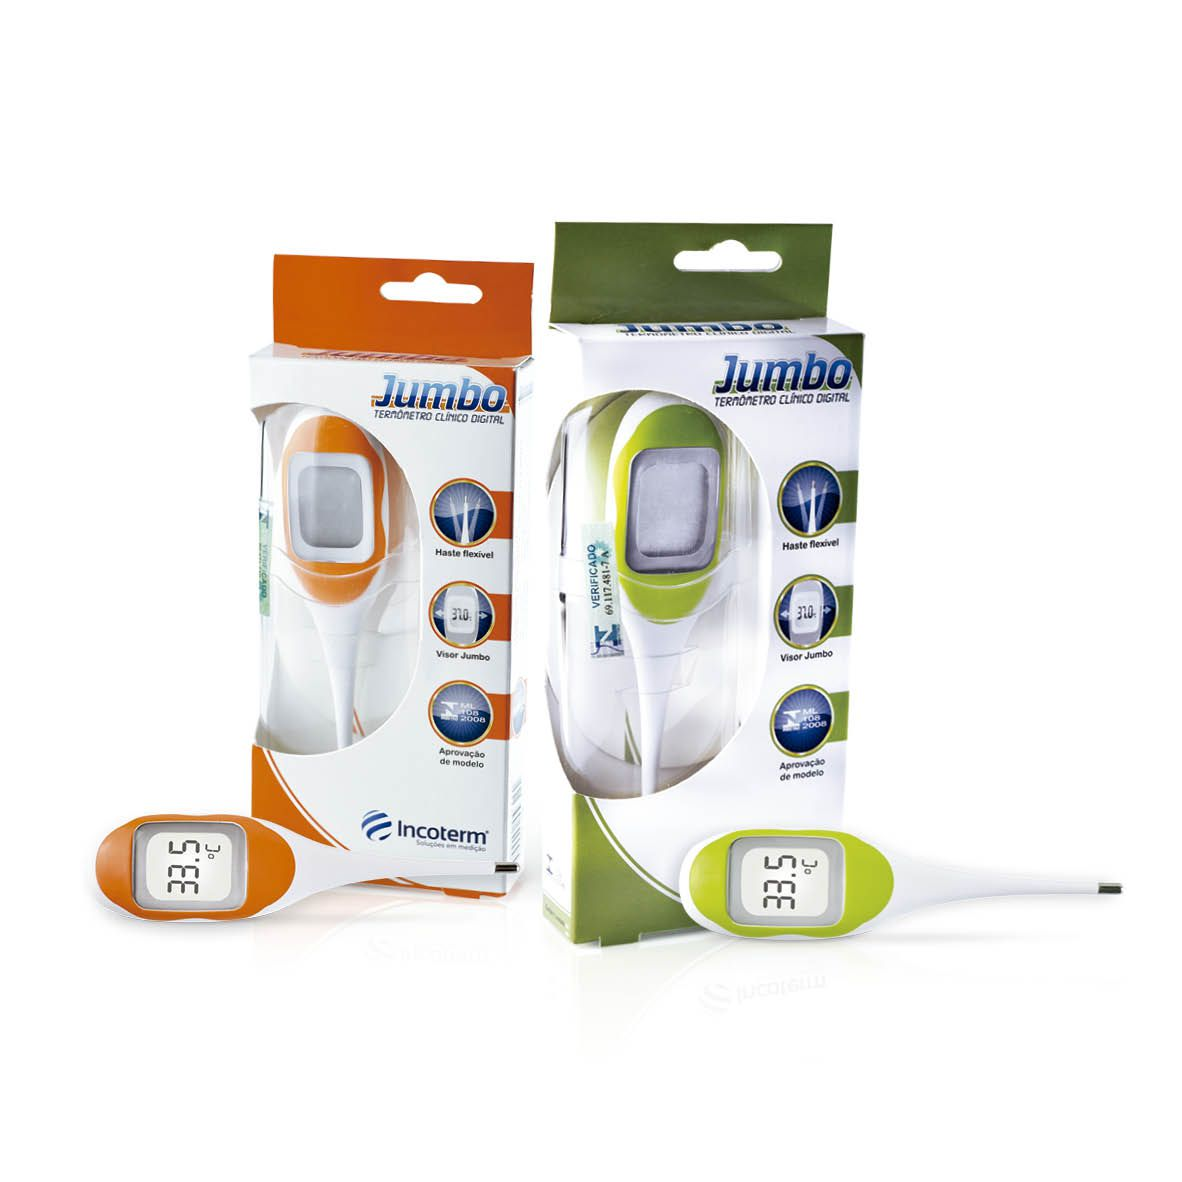 Termômetro Clínico Digital Jumbo - Laranja